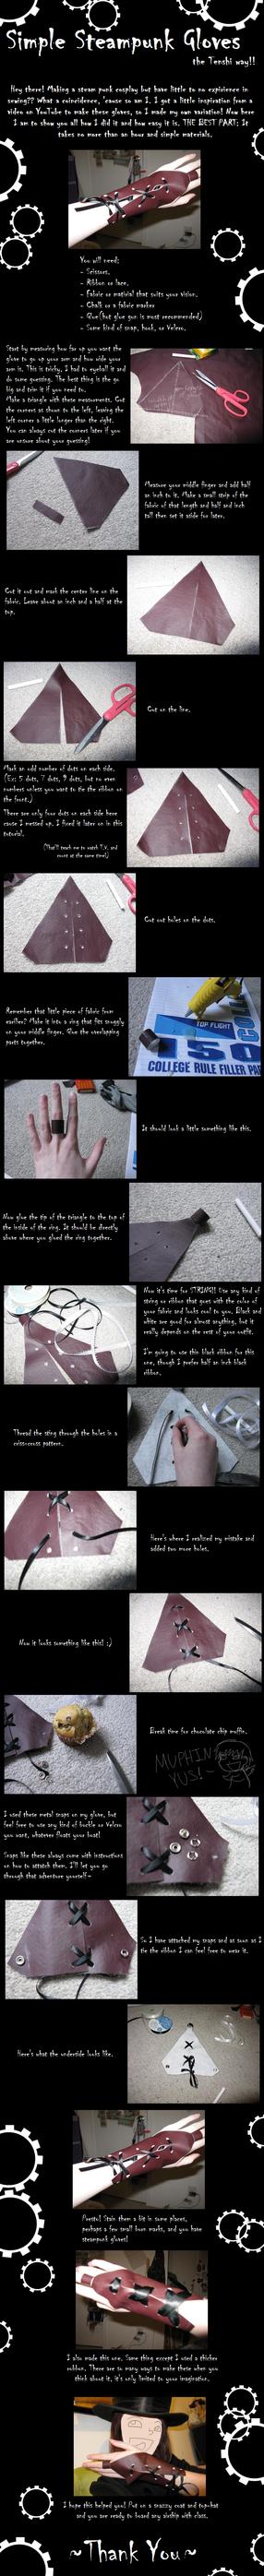 Simple Steampunk Gloves Tut. by tenshiketsueki1000